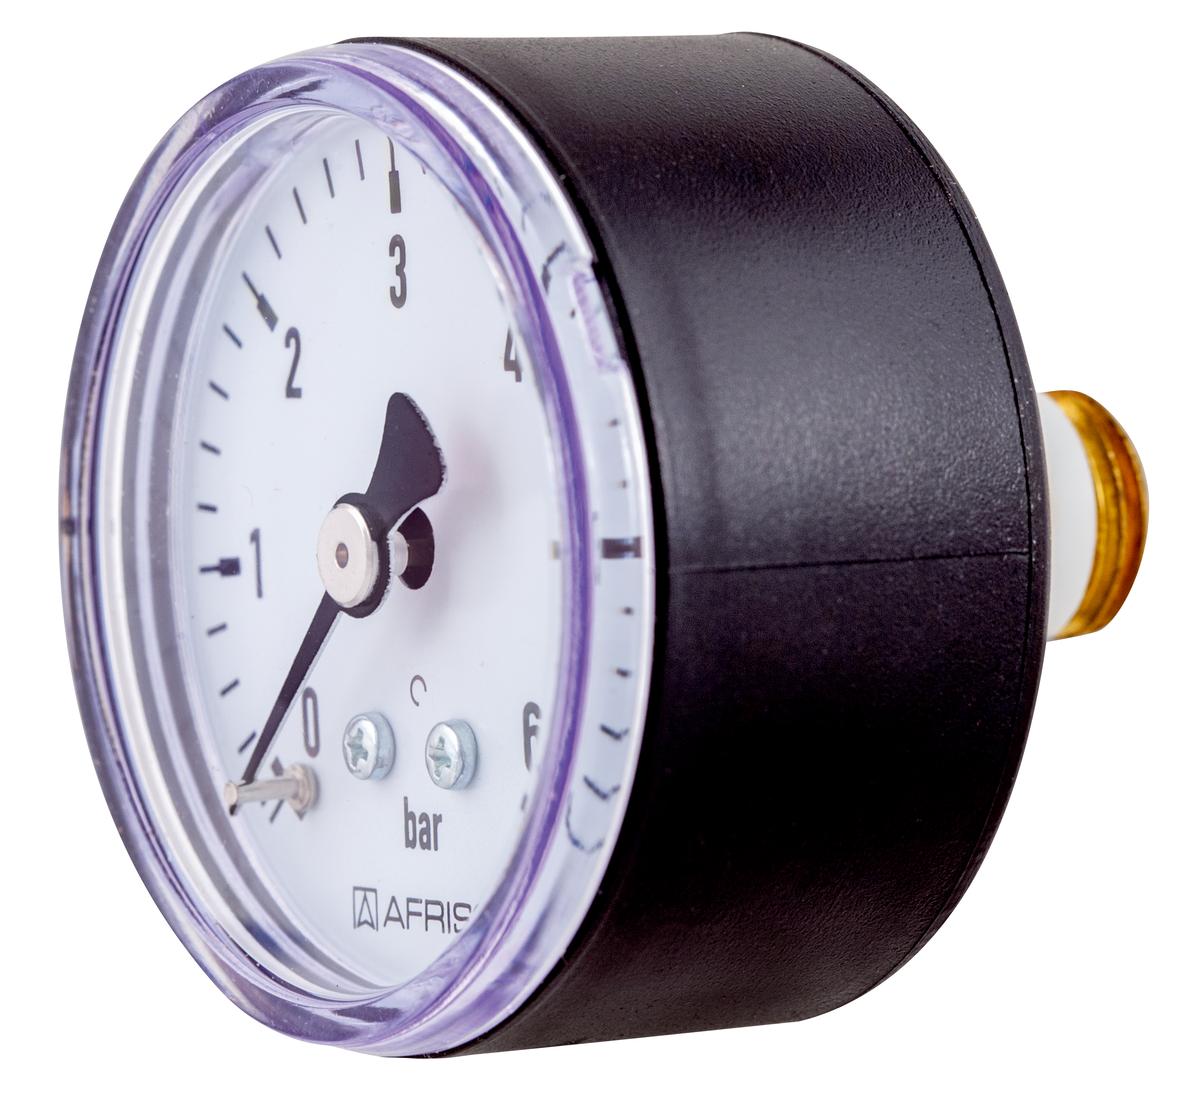 1//4 Rohrfeder-Manometer f/ür Heizung//Sanit/är DN8 3bar Markierung /Ø63mm Axial Afriso